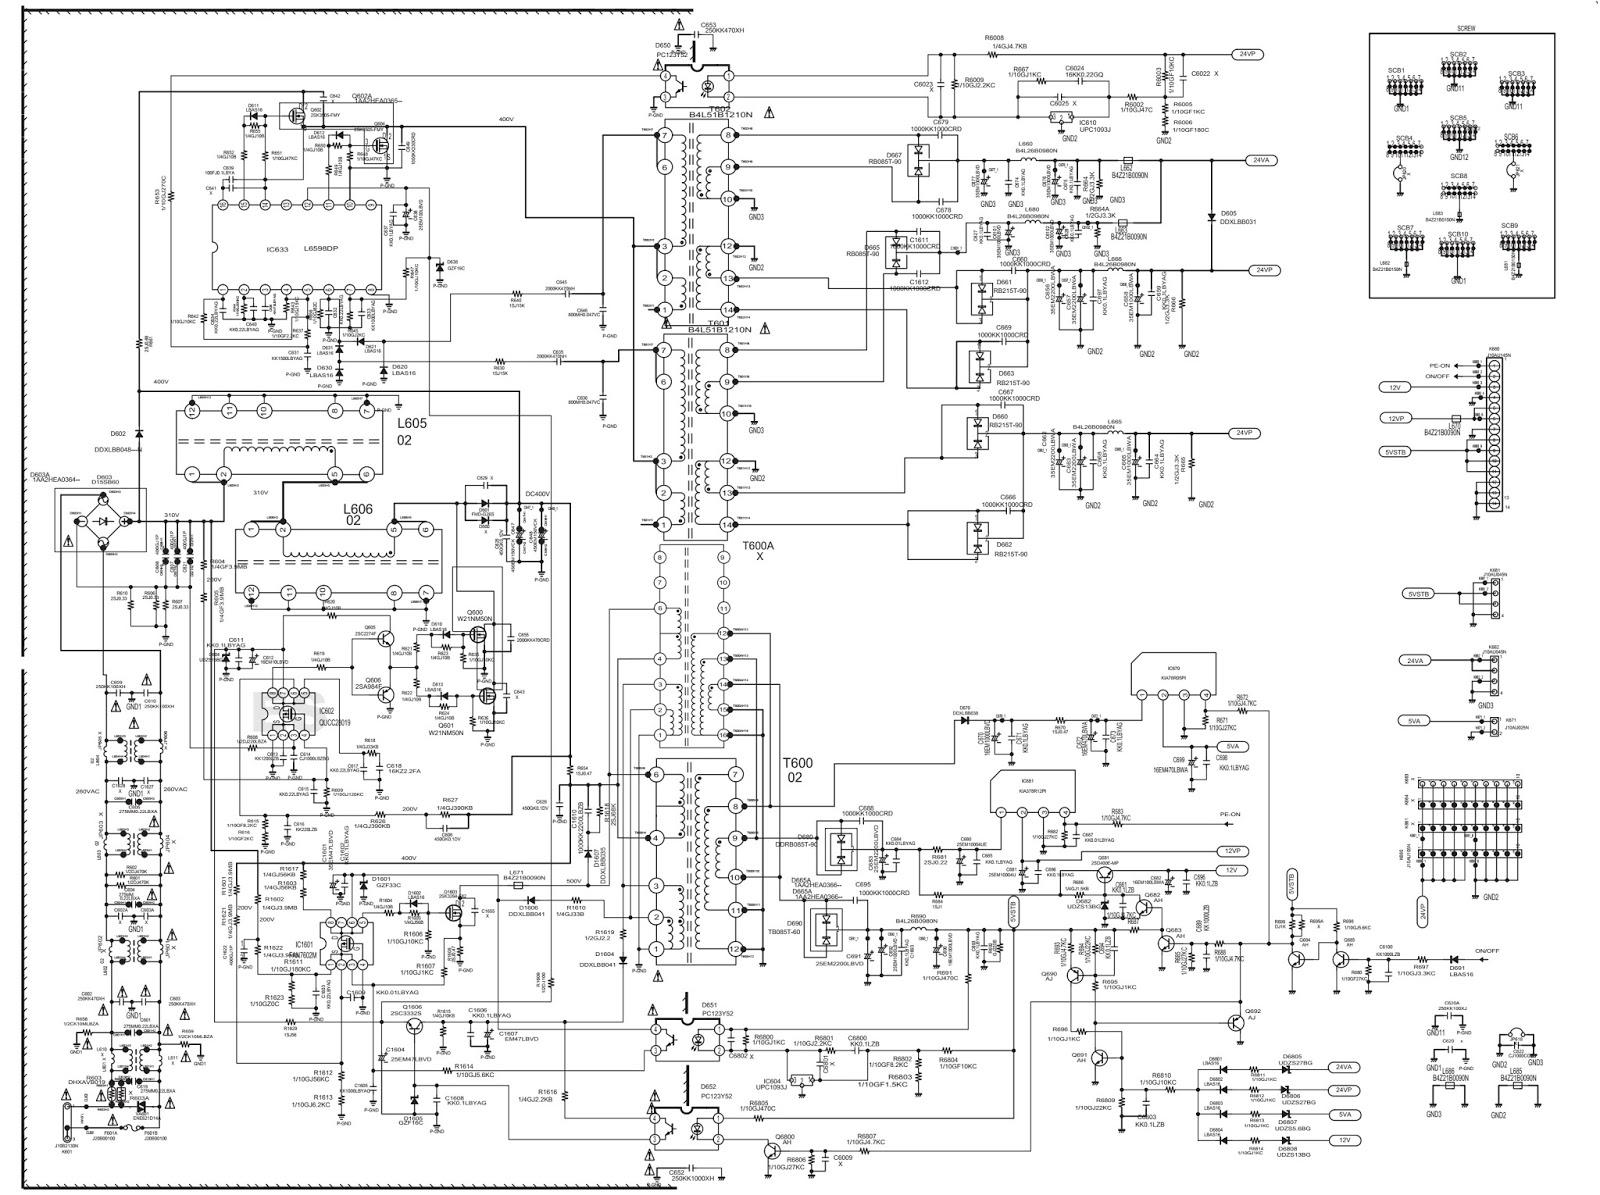 Electronic Equipment Repair Centre Sanyo Lcd 47s10 Hd